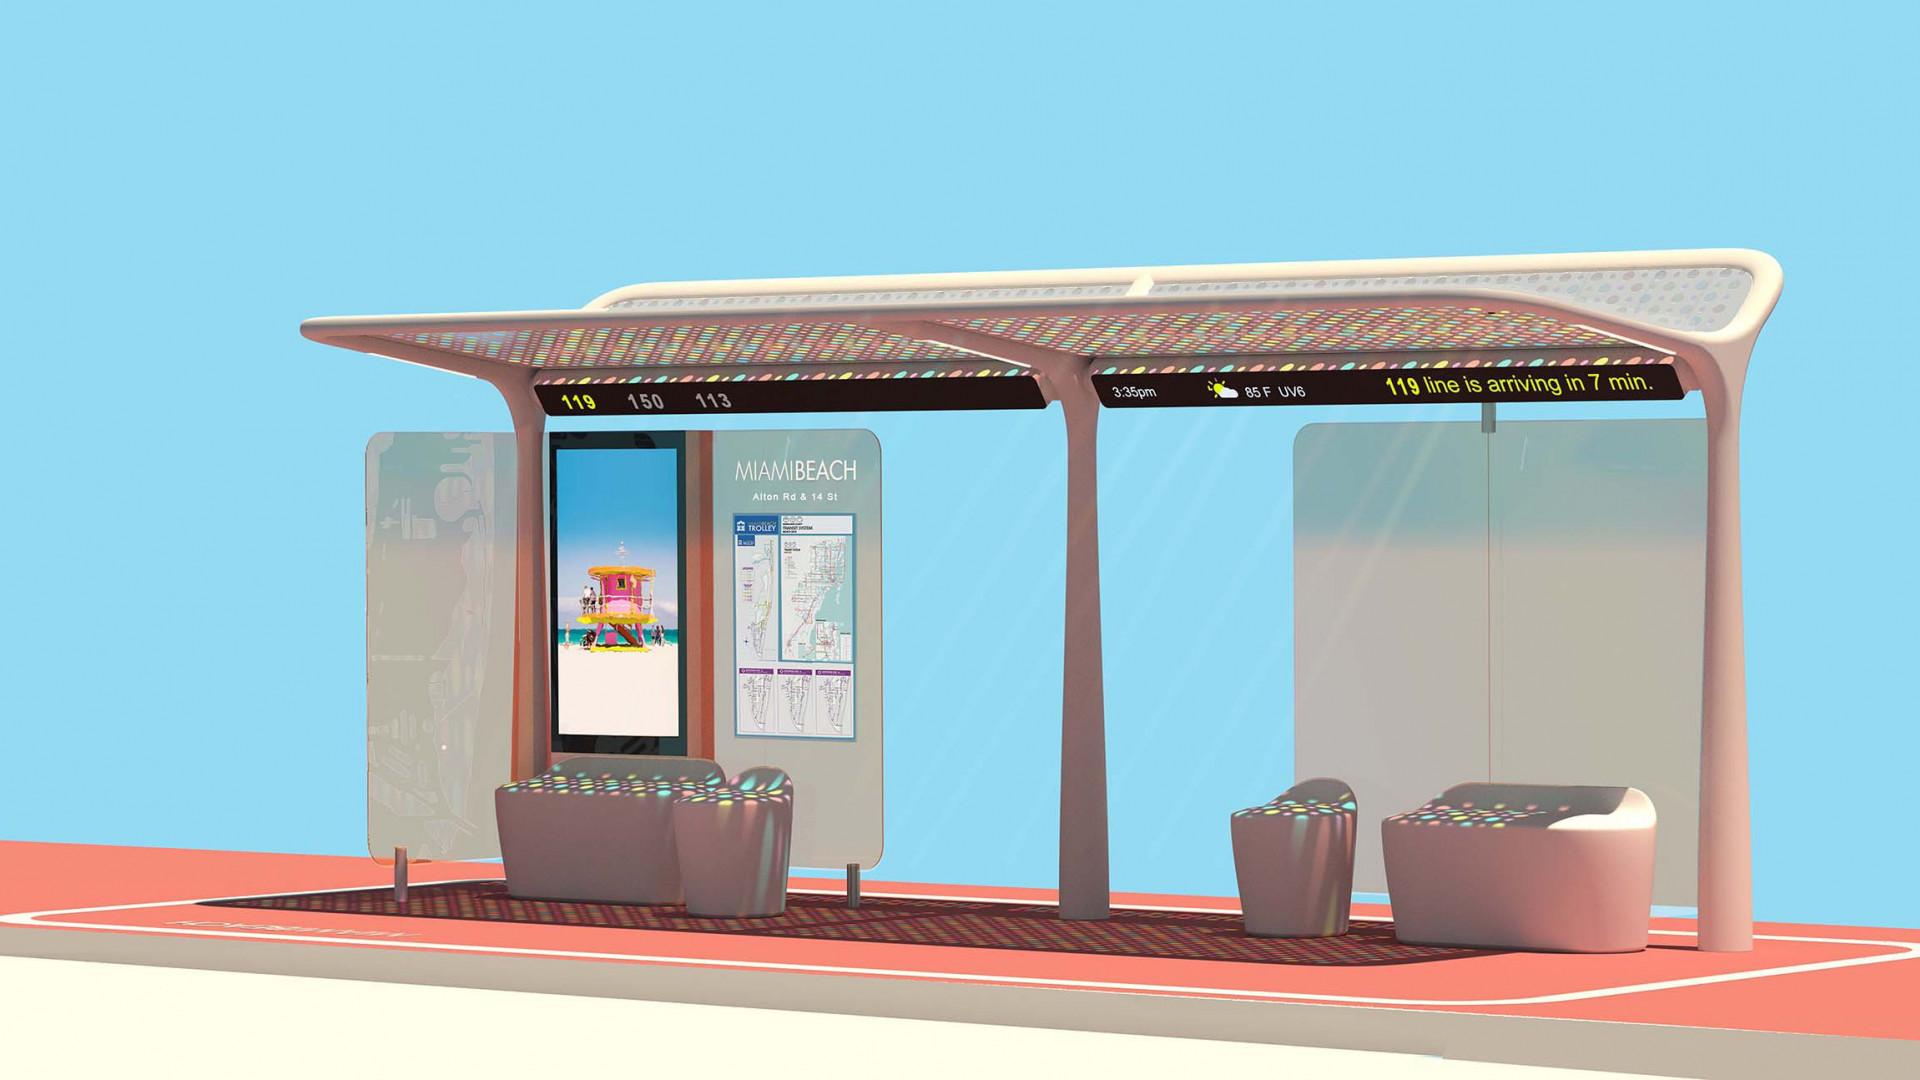 Miami Beach Bus Shelter